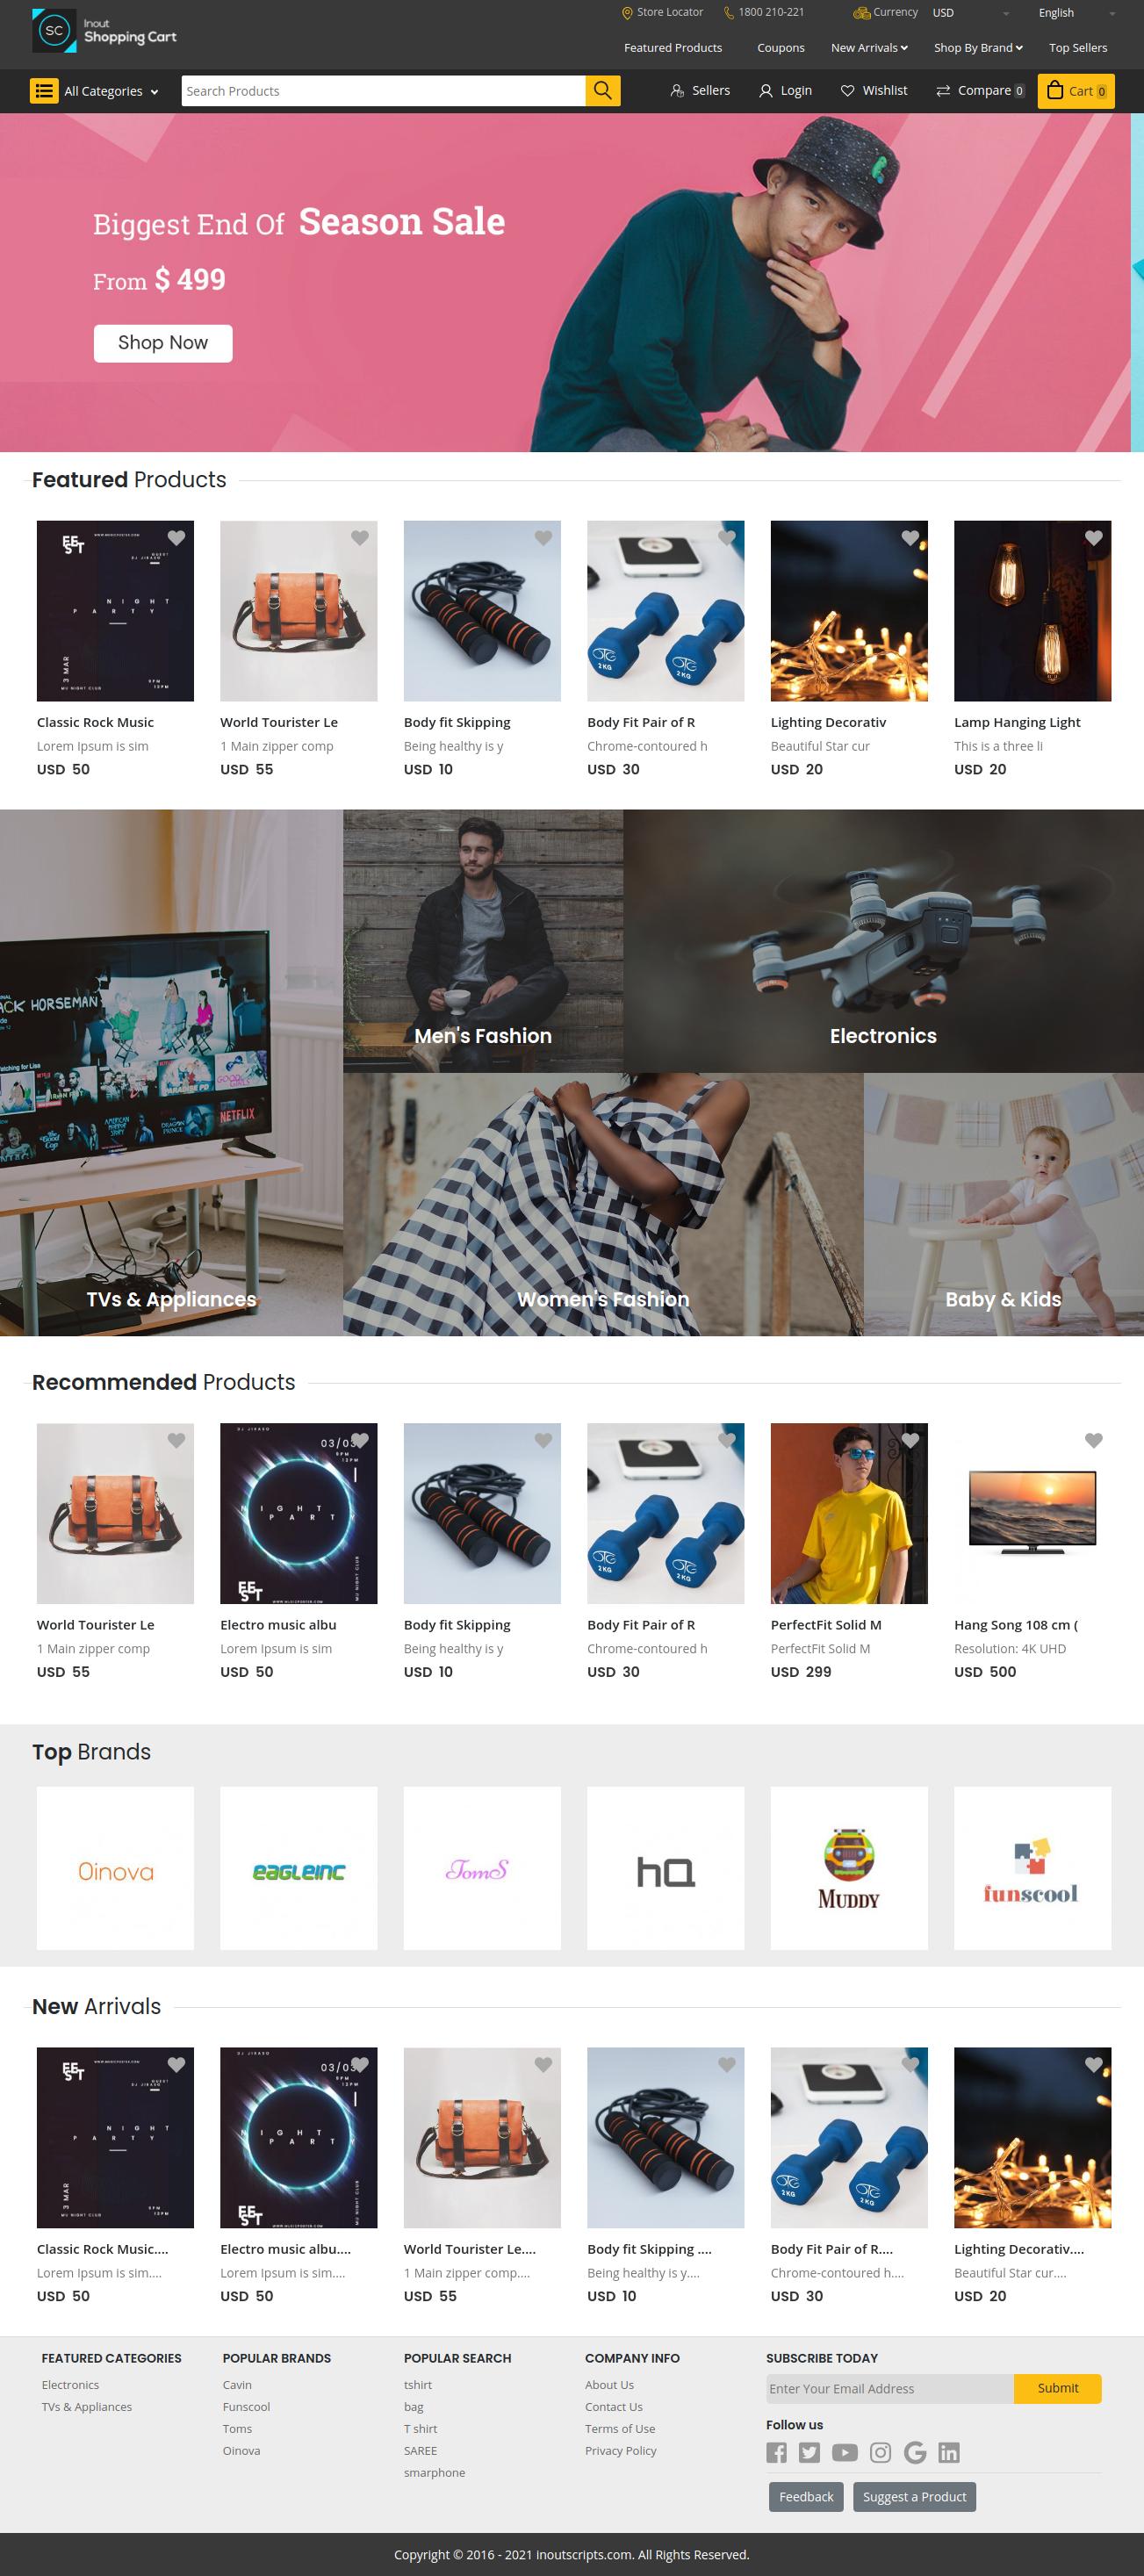 Inout Shopping Cart - Multi Vendor Edition - Screenshot 1